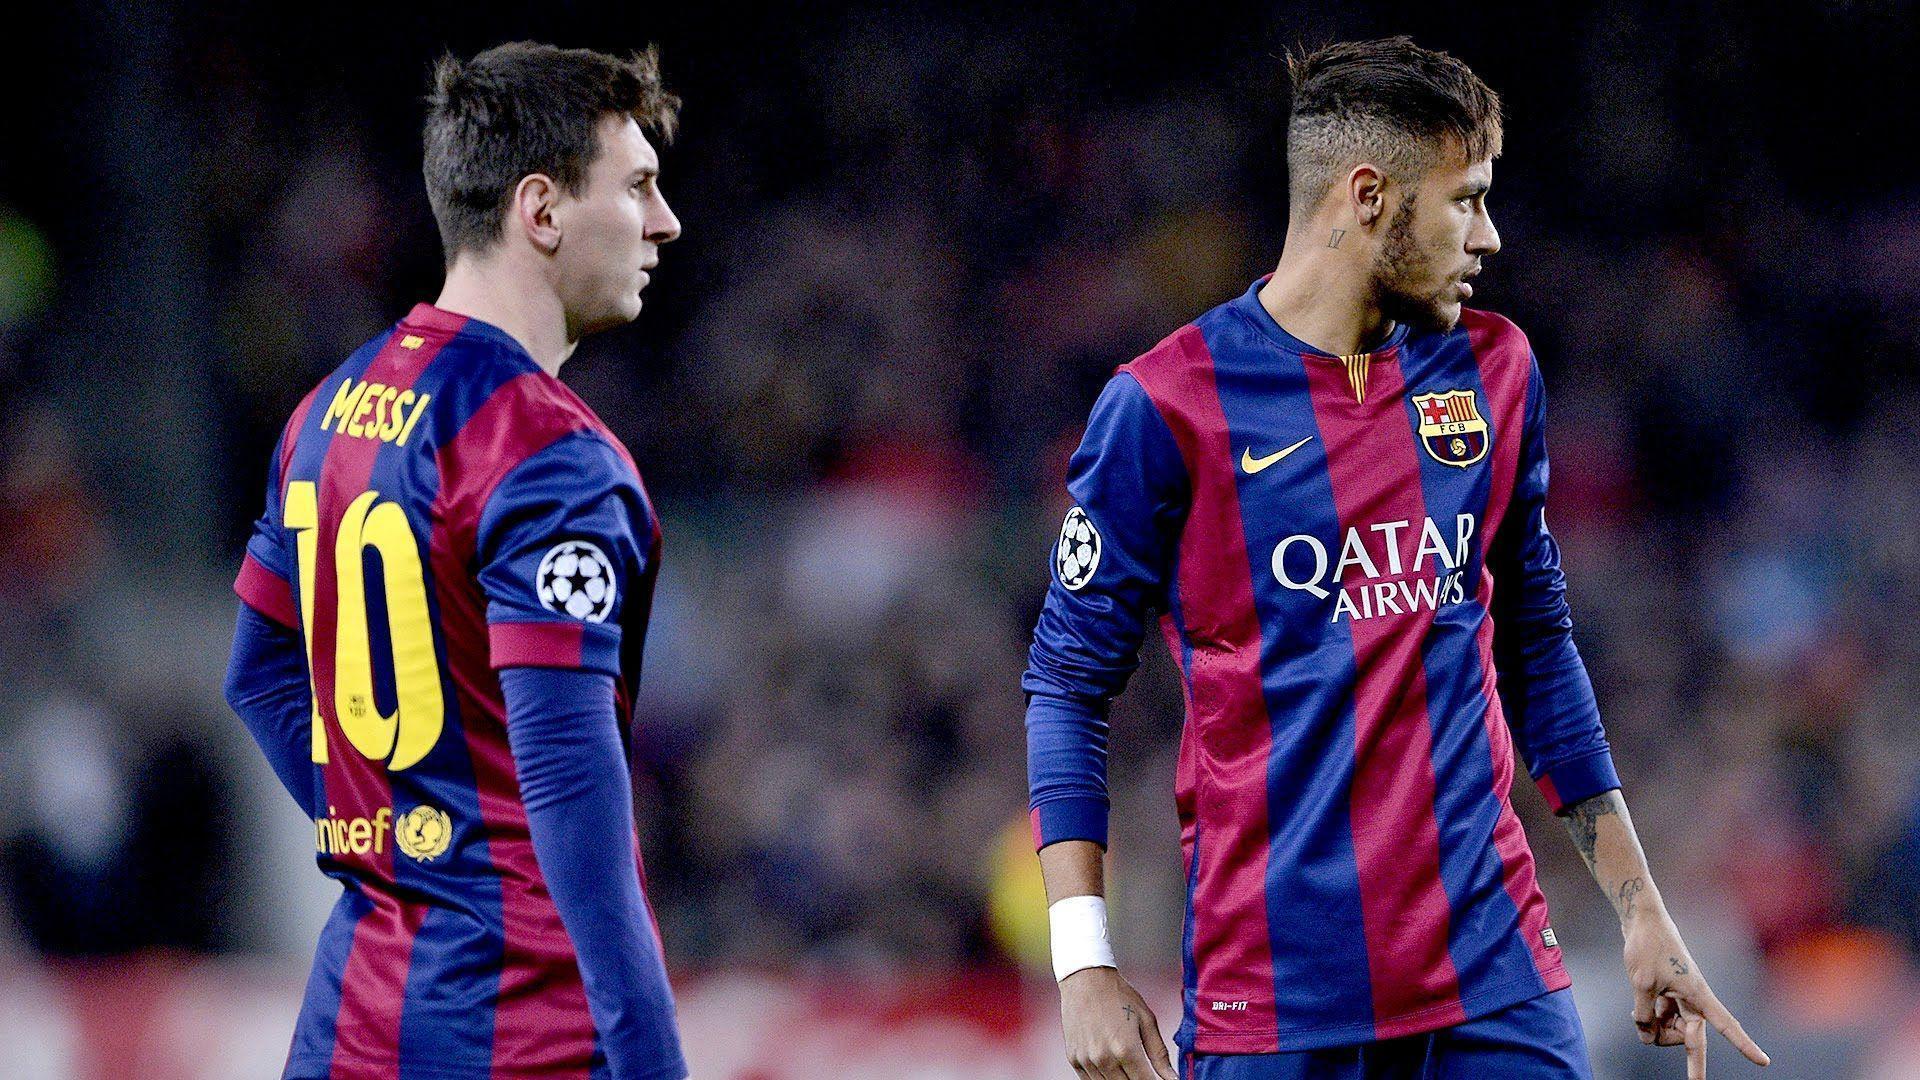 Hd Images Of Neymar: Neymar HD Wallpapers 2016